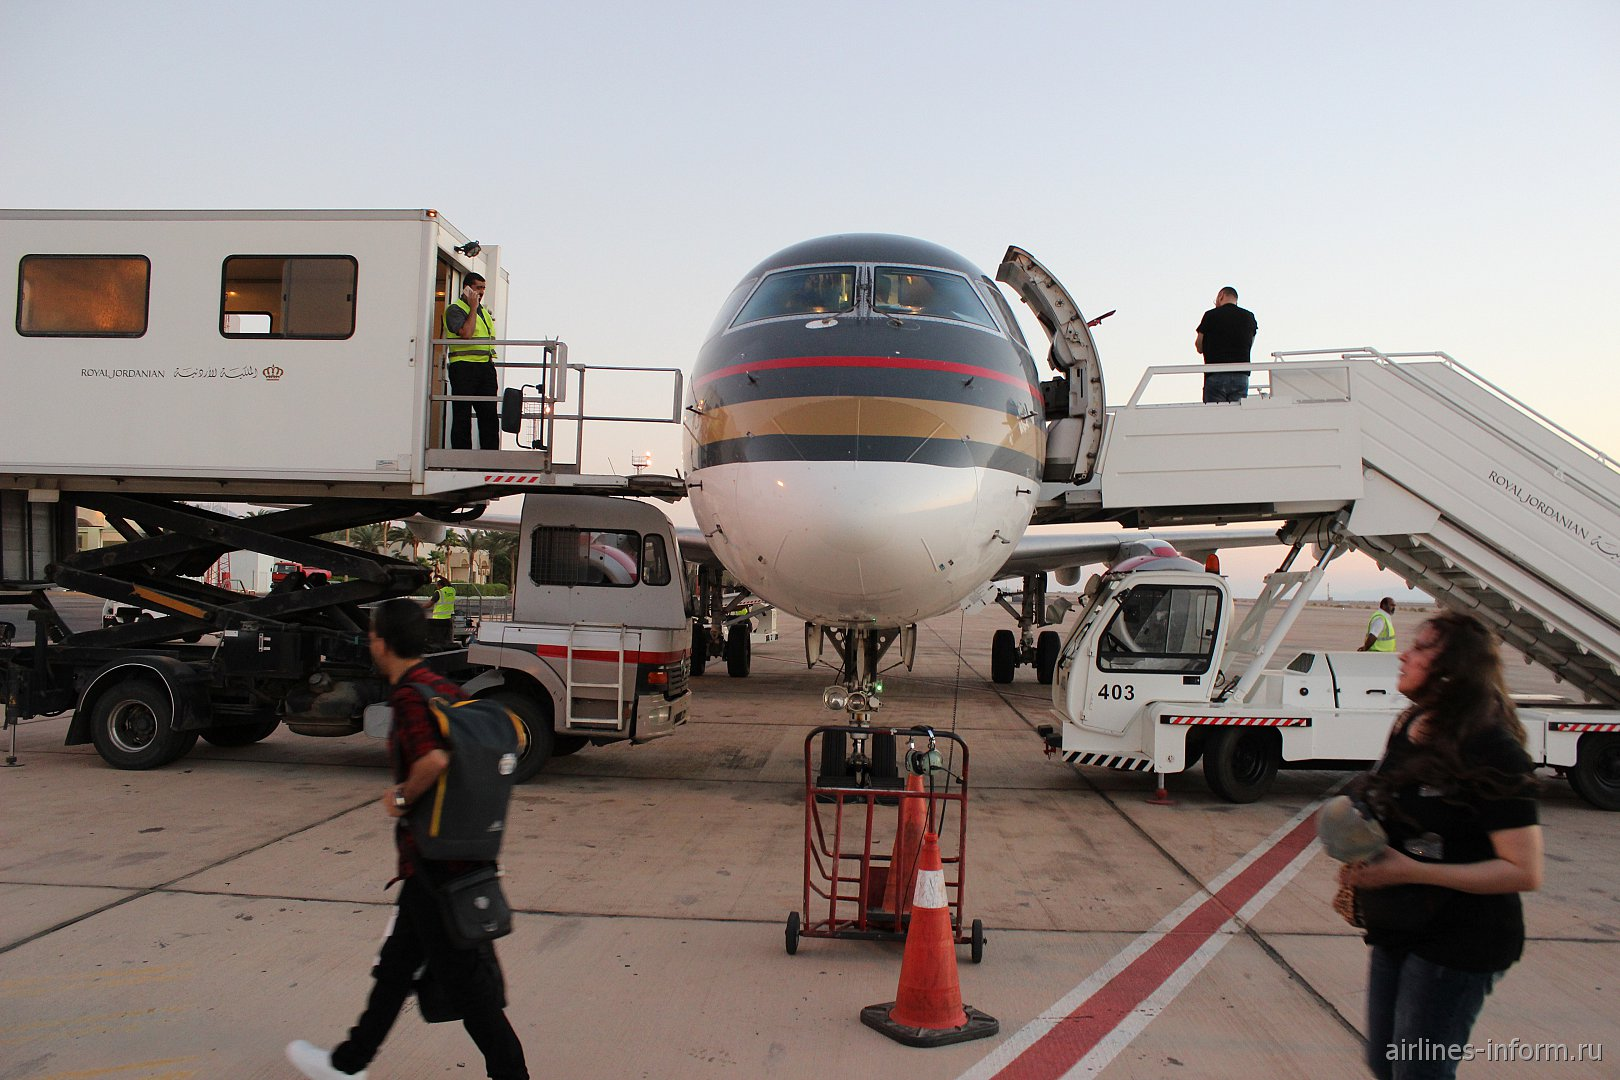 Летний отпуск. Часть 4 - Amman (Queen Alia - AMM) - Aqaba (King Hussein - AQJ) с Royal Jordanian на Embraer-195